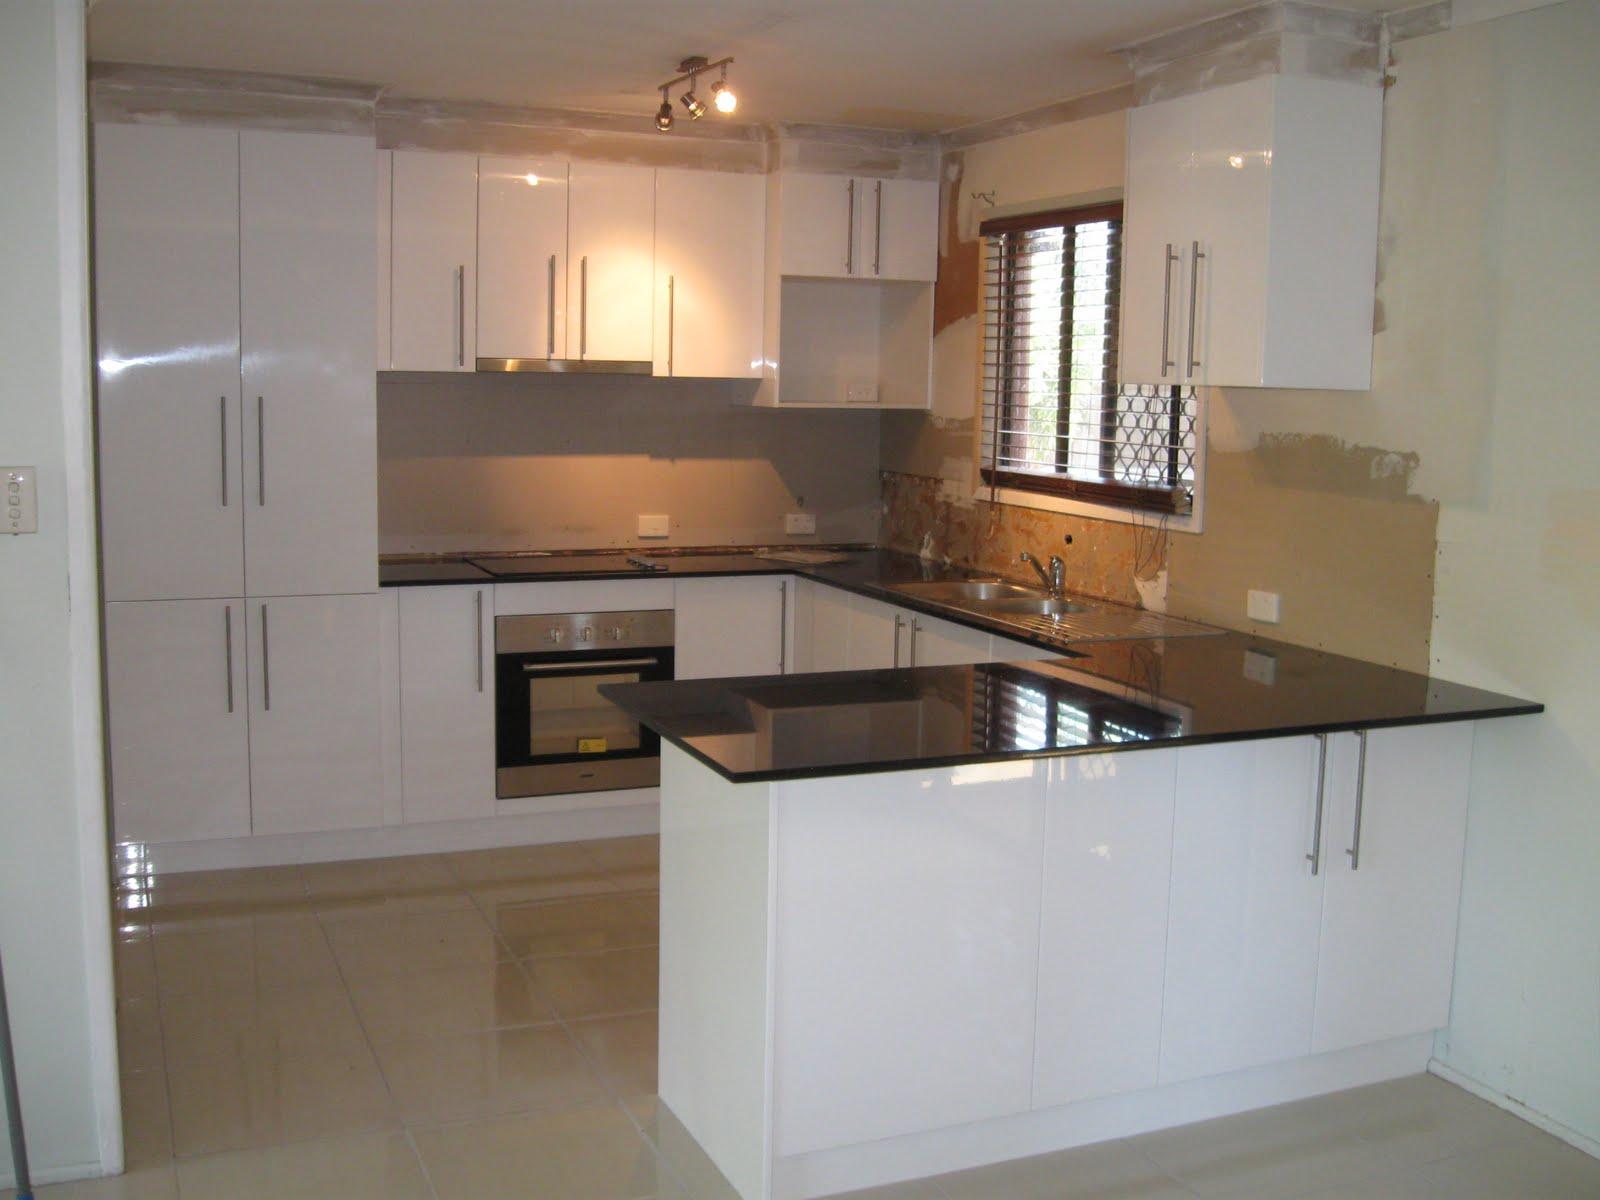 kitchen designs for u shaped kitchens photo - 2